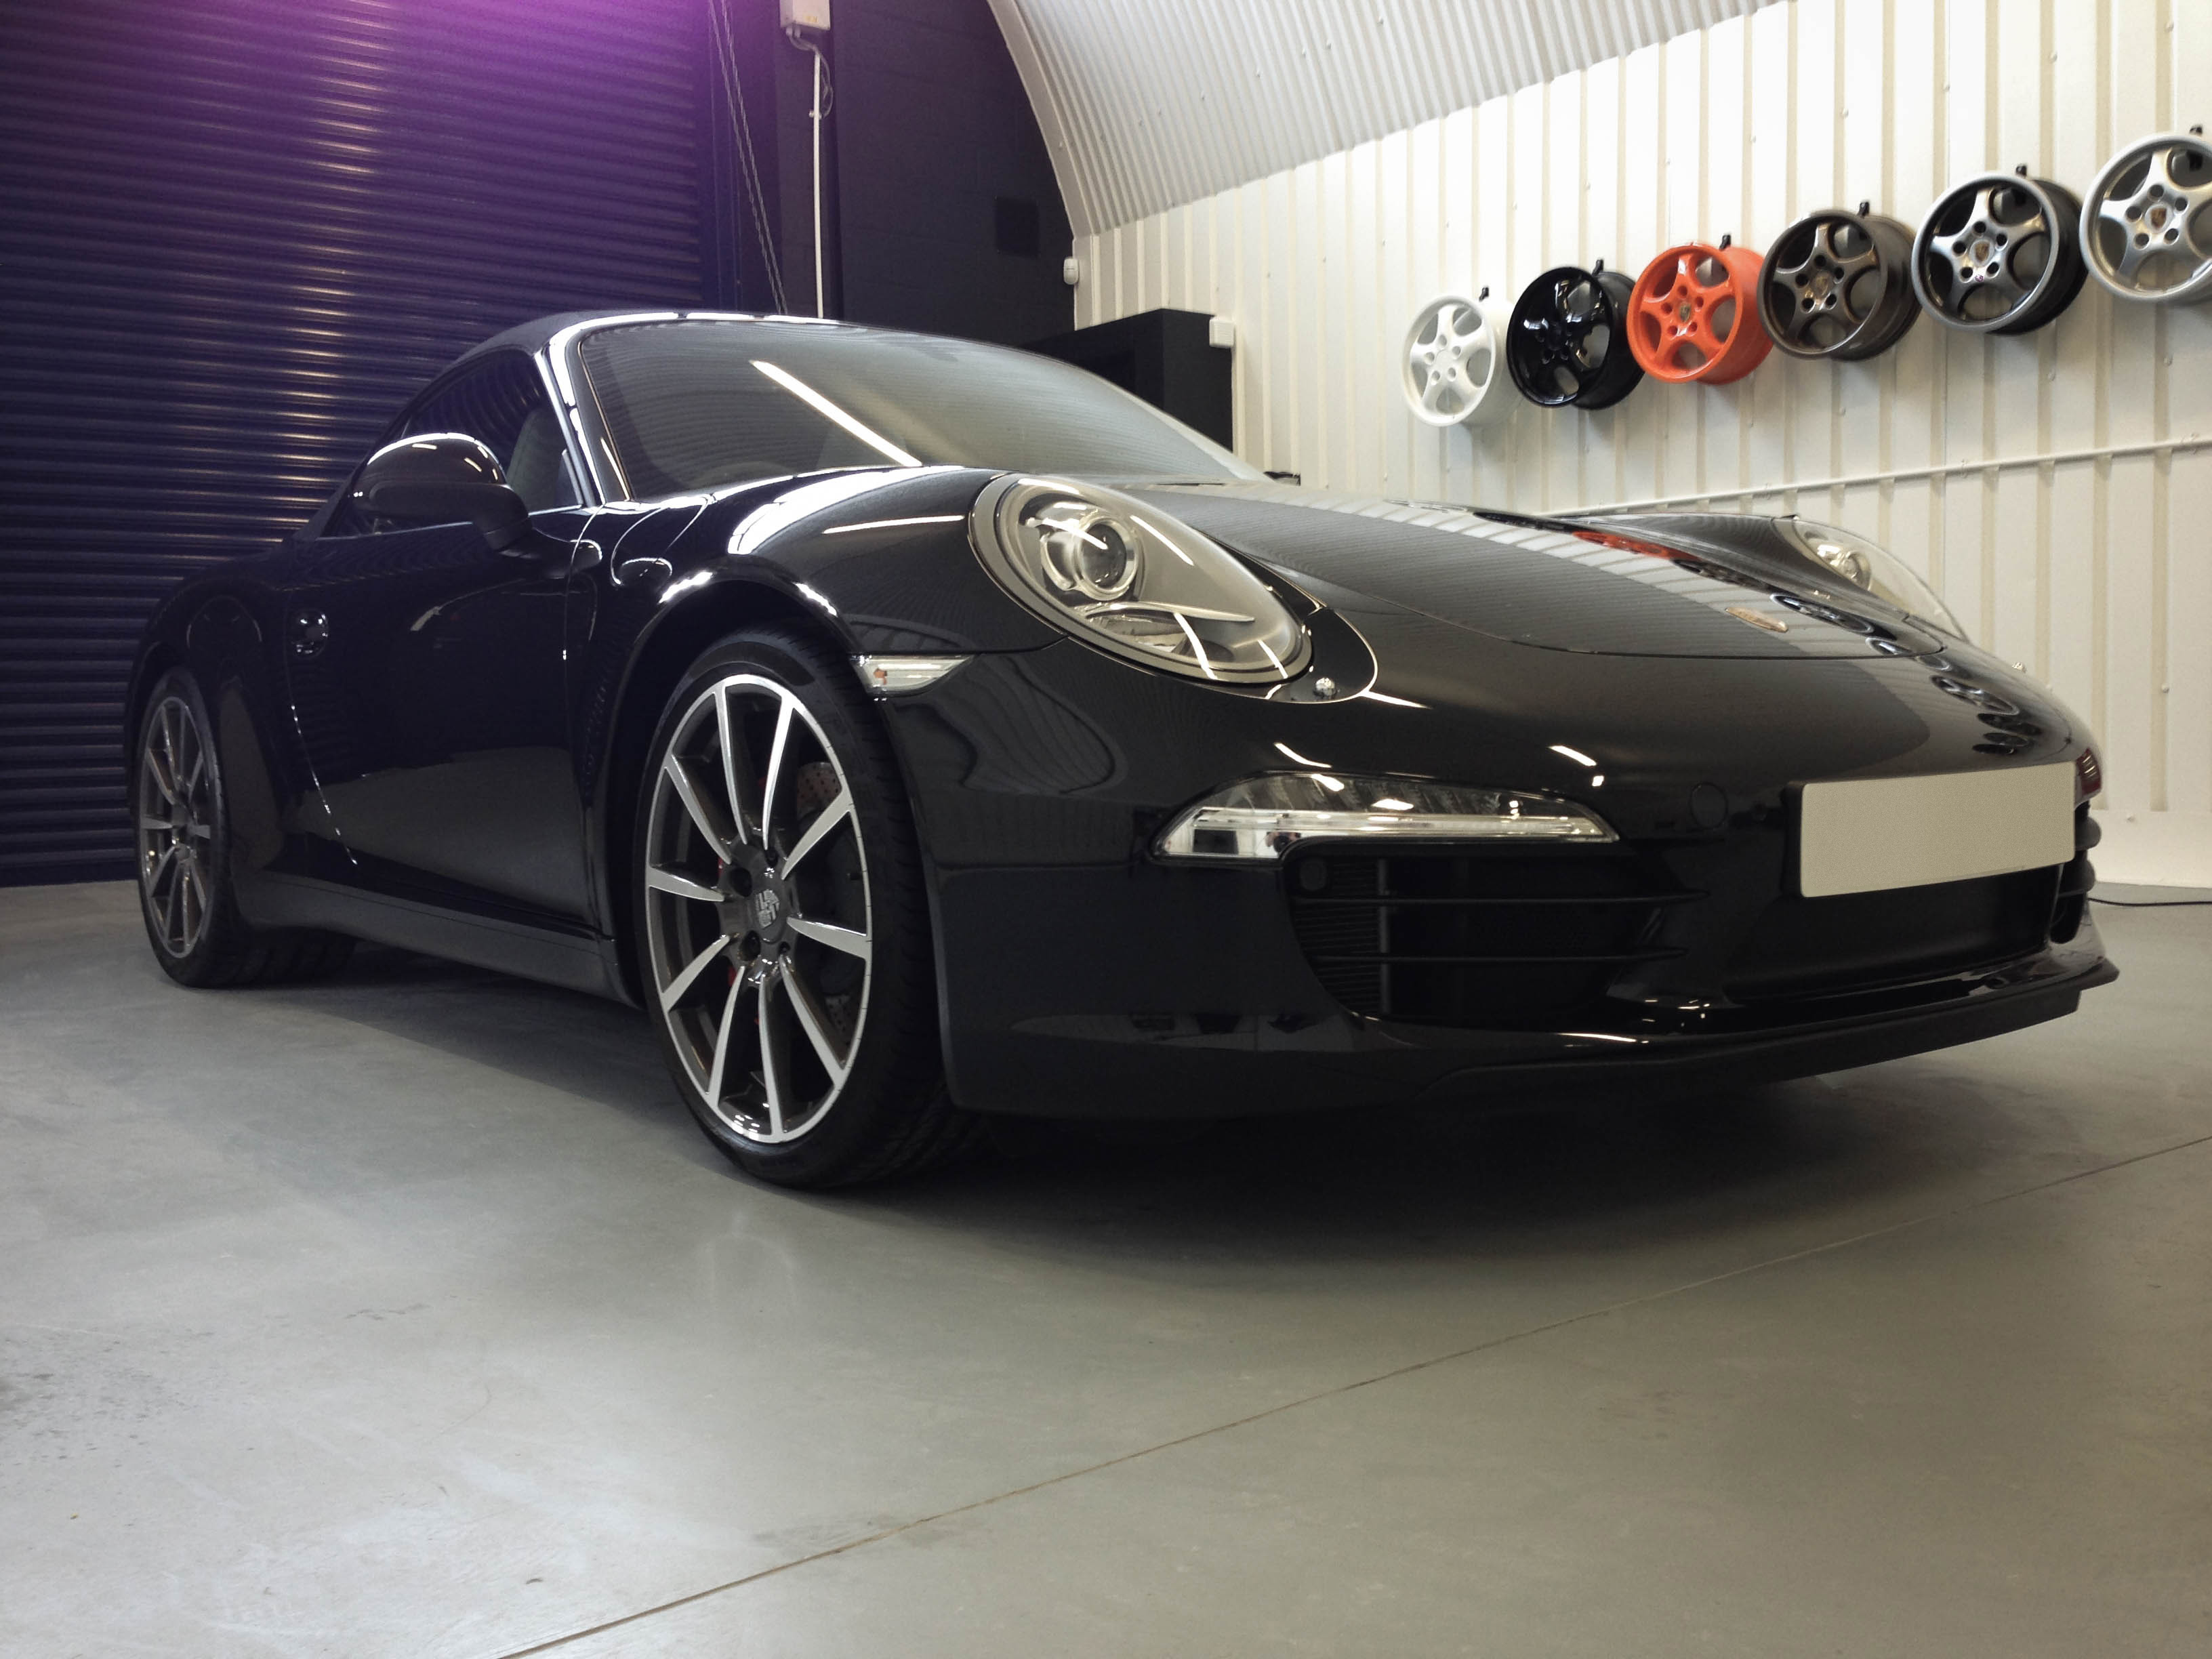 Porsche 911 4S – Front 2